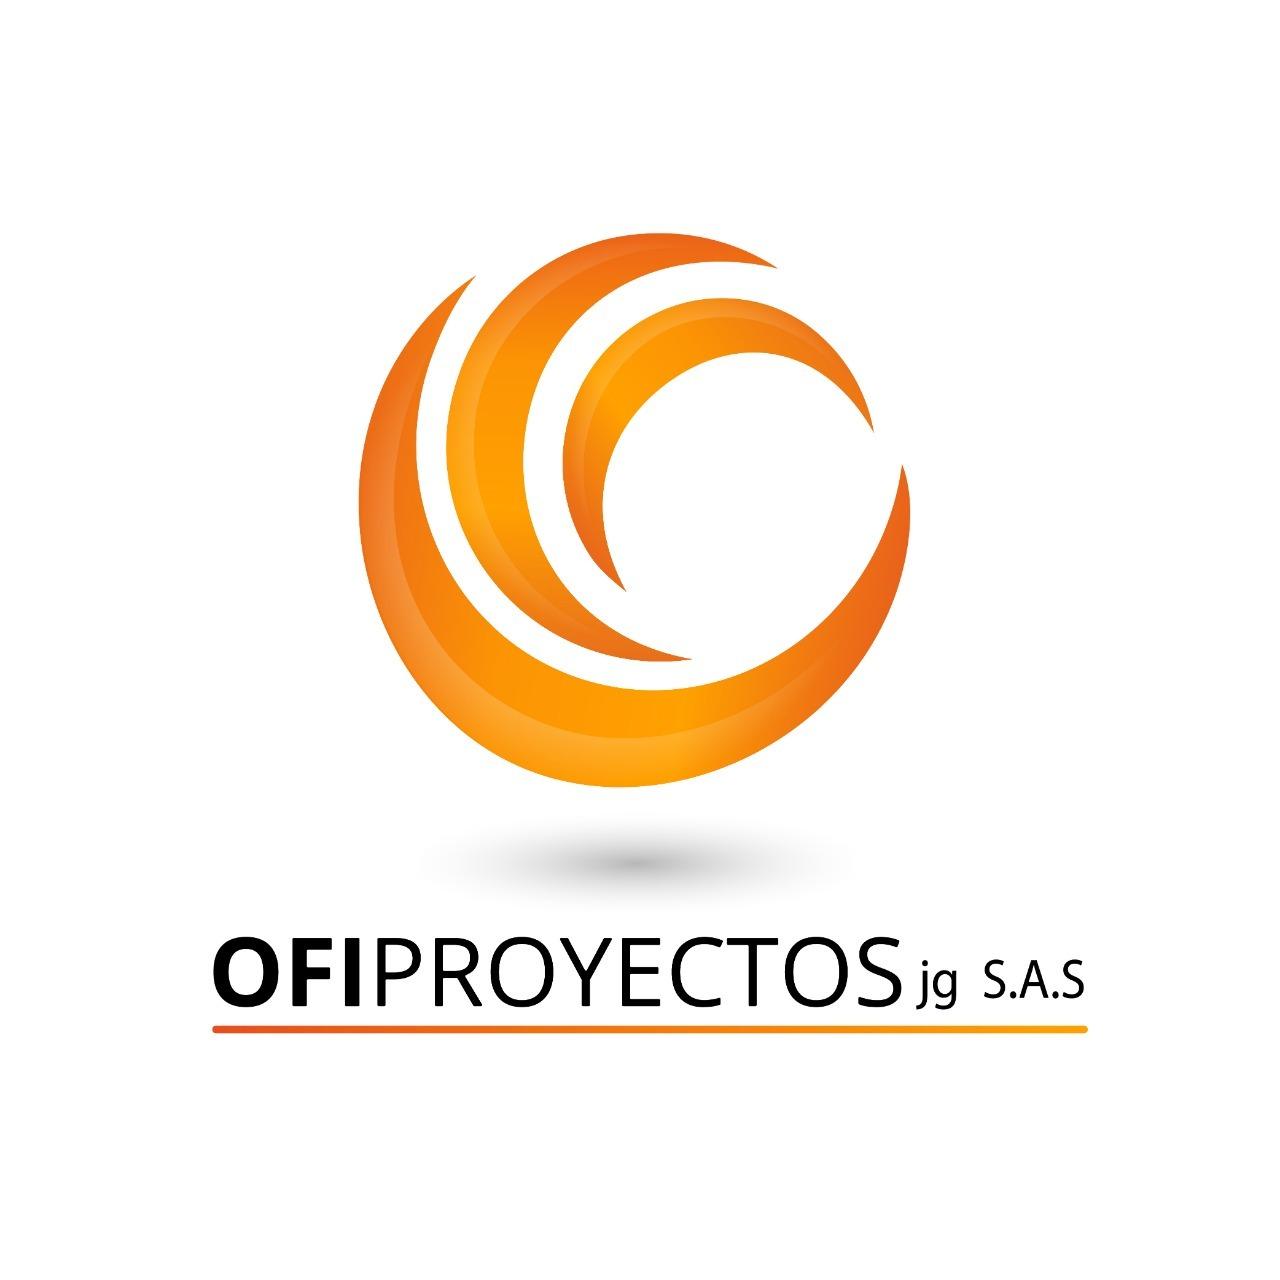 Cliente net2phone - Ofi Proyectos -